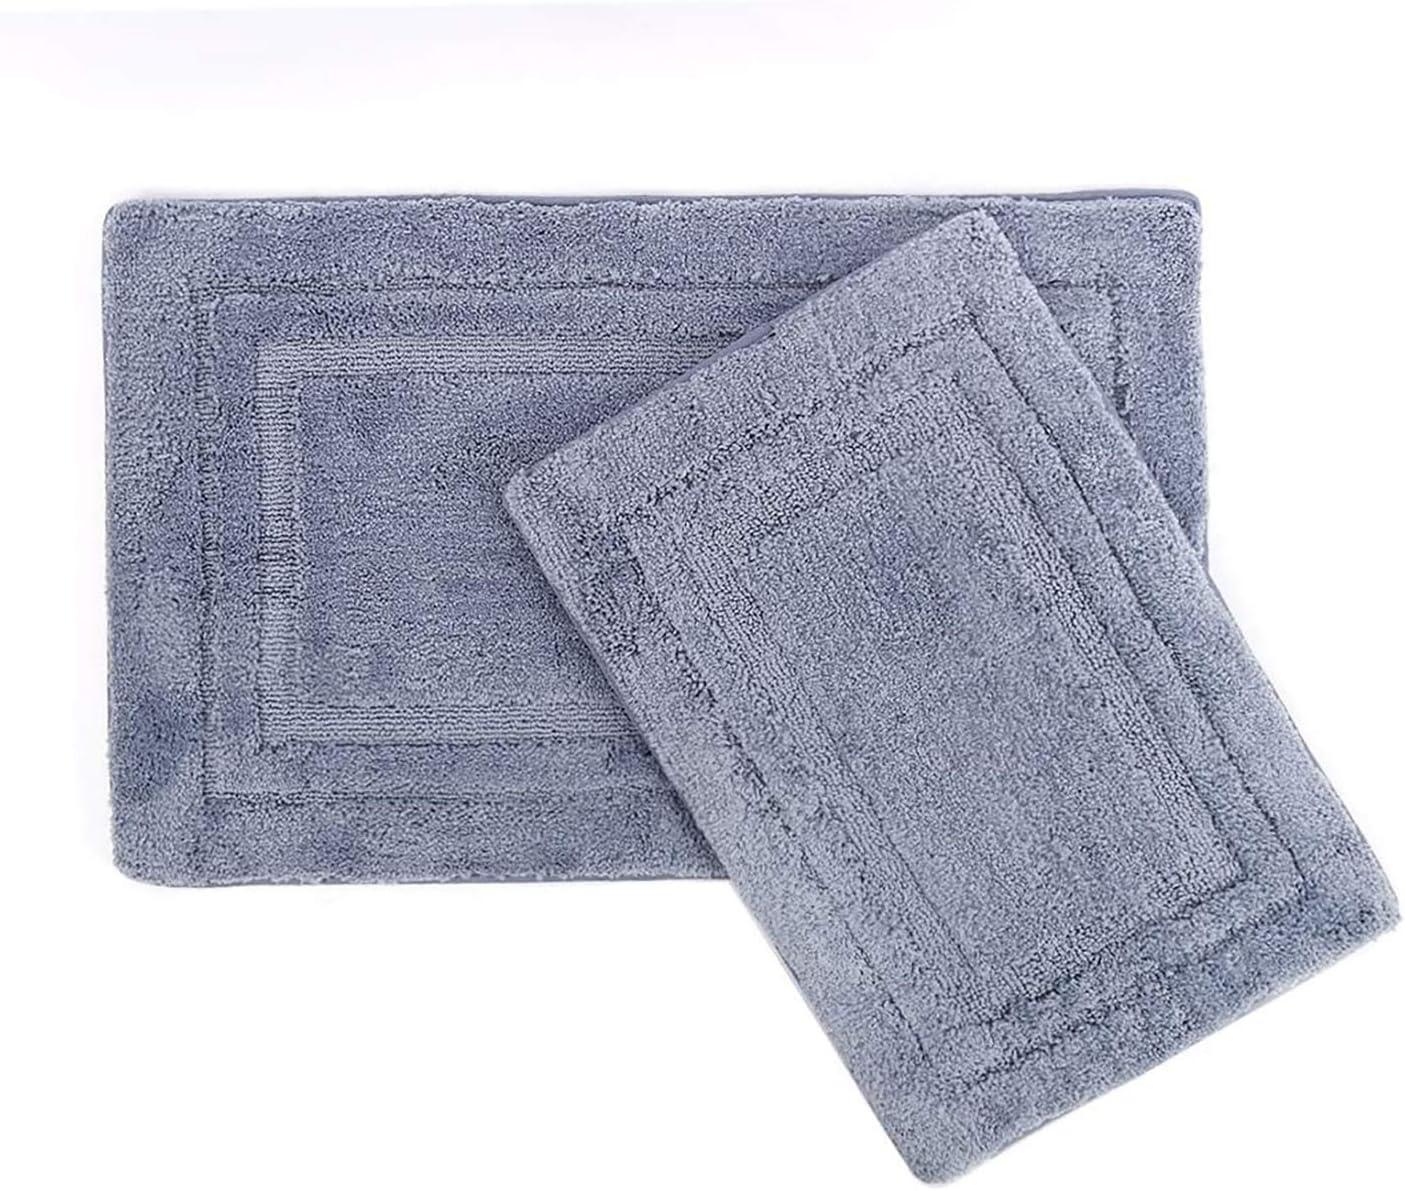 WEIJ Thicken Bathroom Rugs Bath Mat Set Soft Water Absorben List Brand new price and